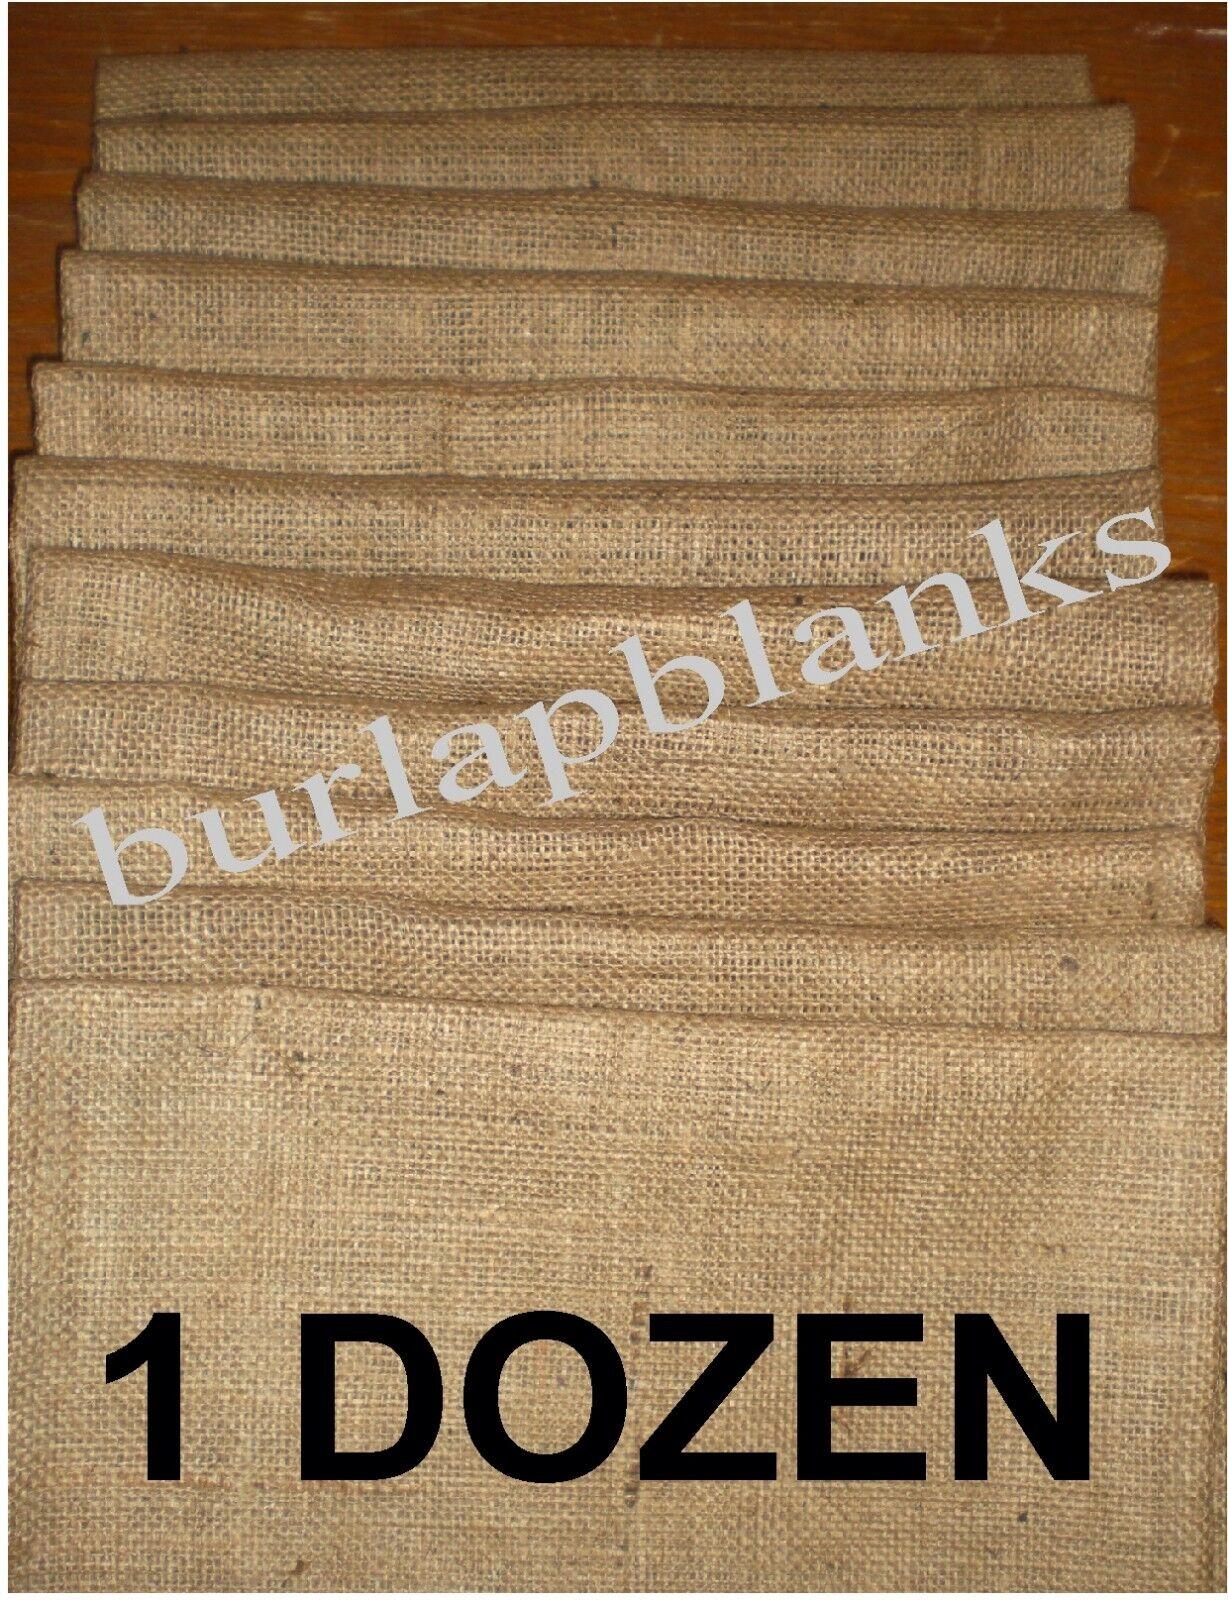 burlap garden flags 1 dozen wh... Image 0